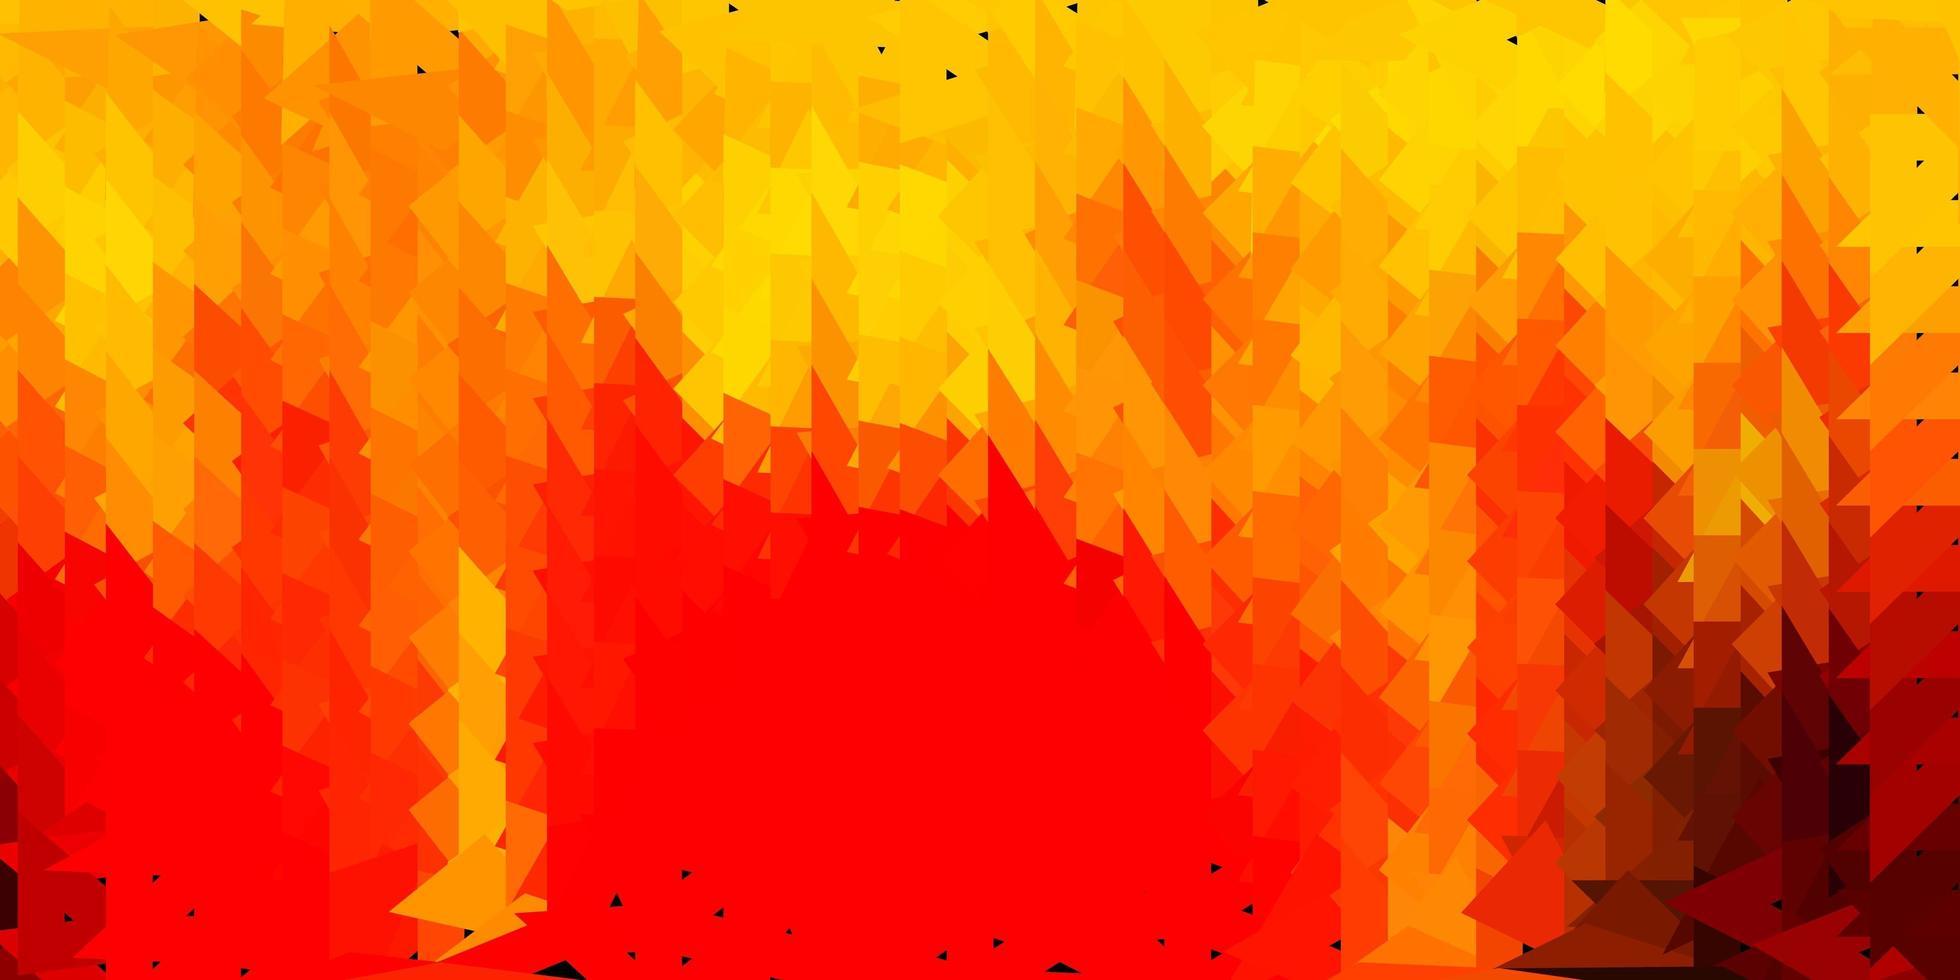 diseño poligonal geométrico vector naranja oscuro.